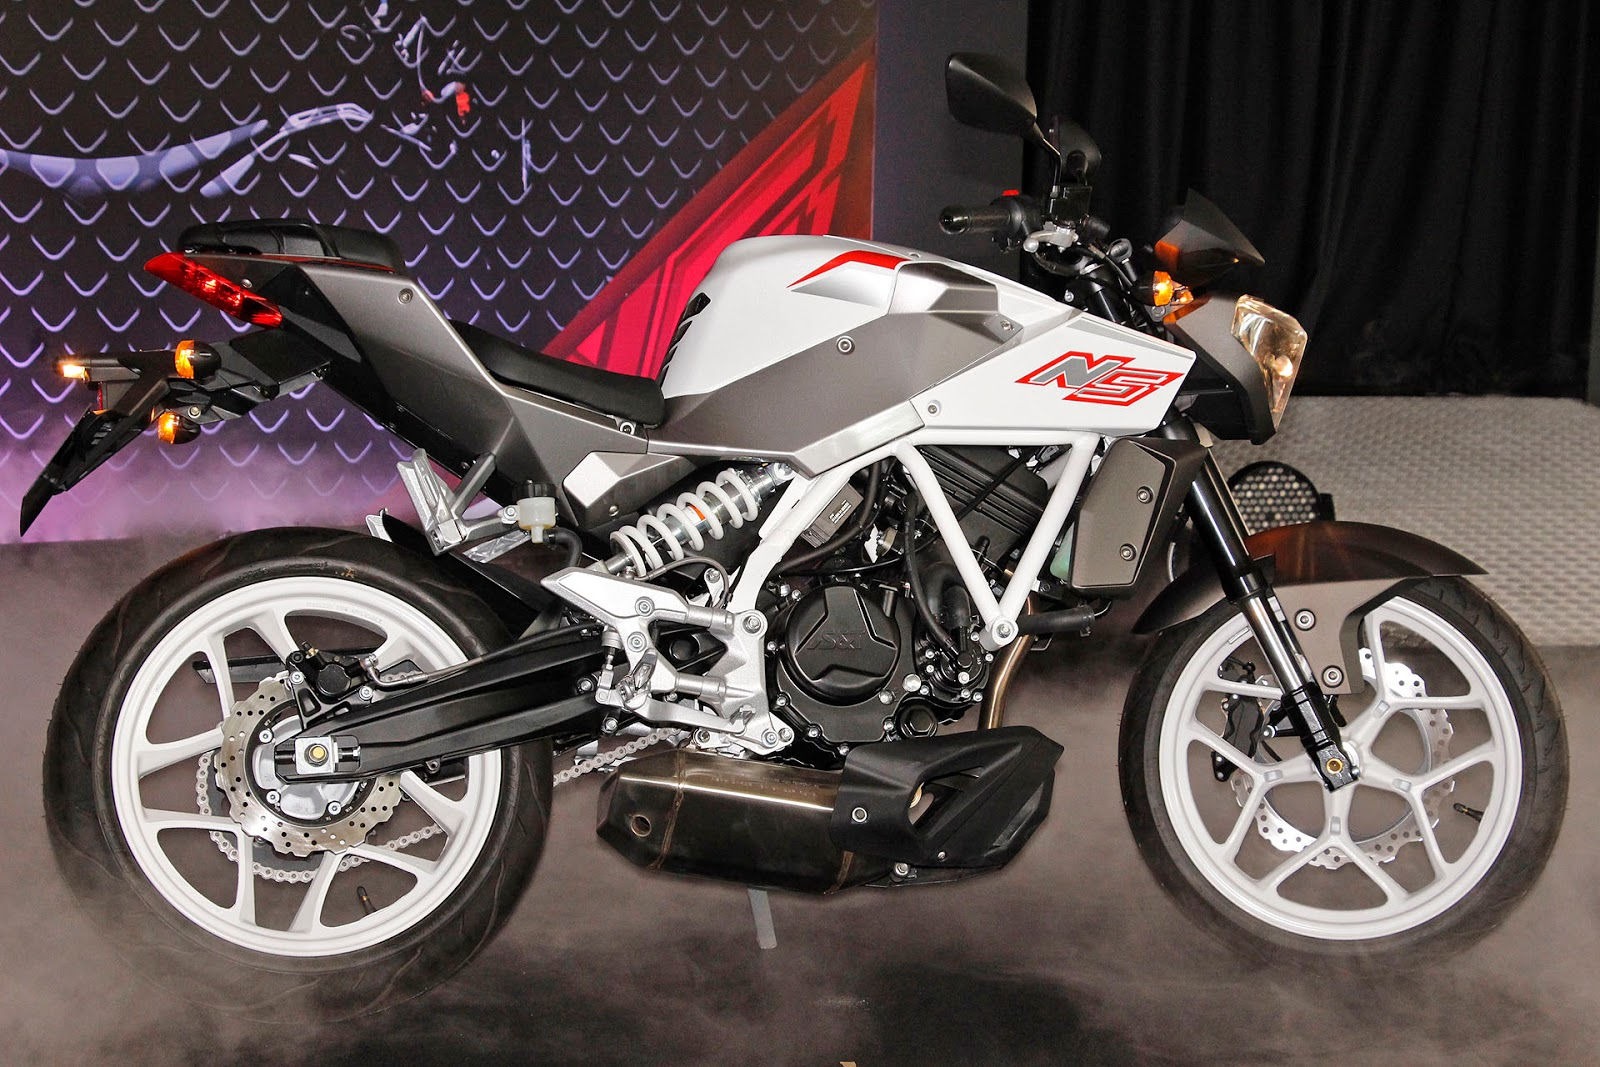 Naza N5 250 Naked Bike - Harga Motosikal Di Malaysia-2555